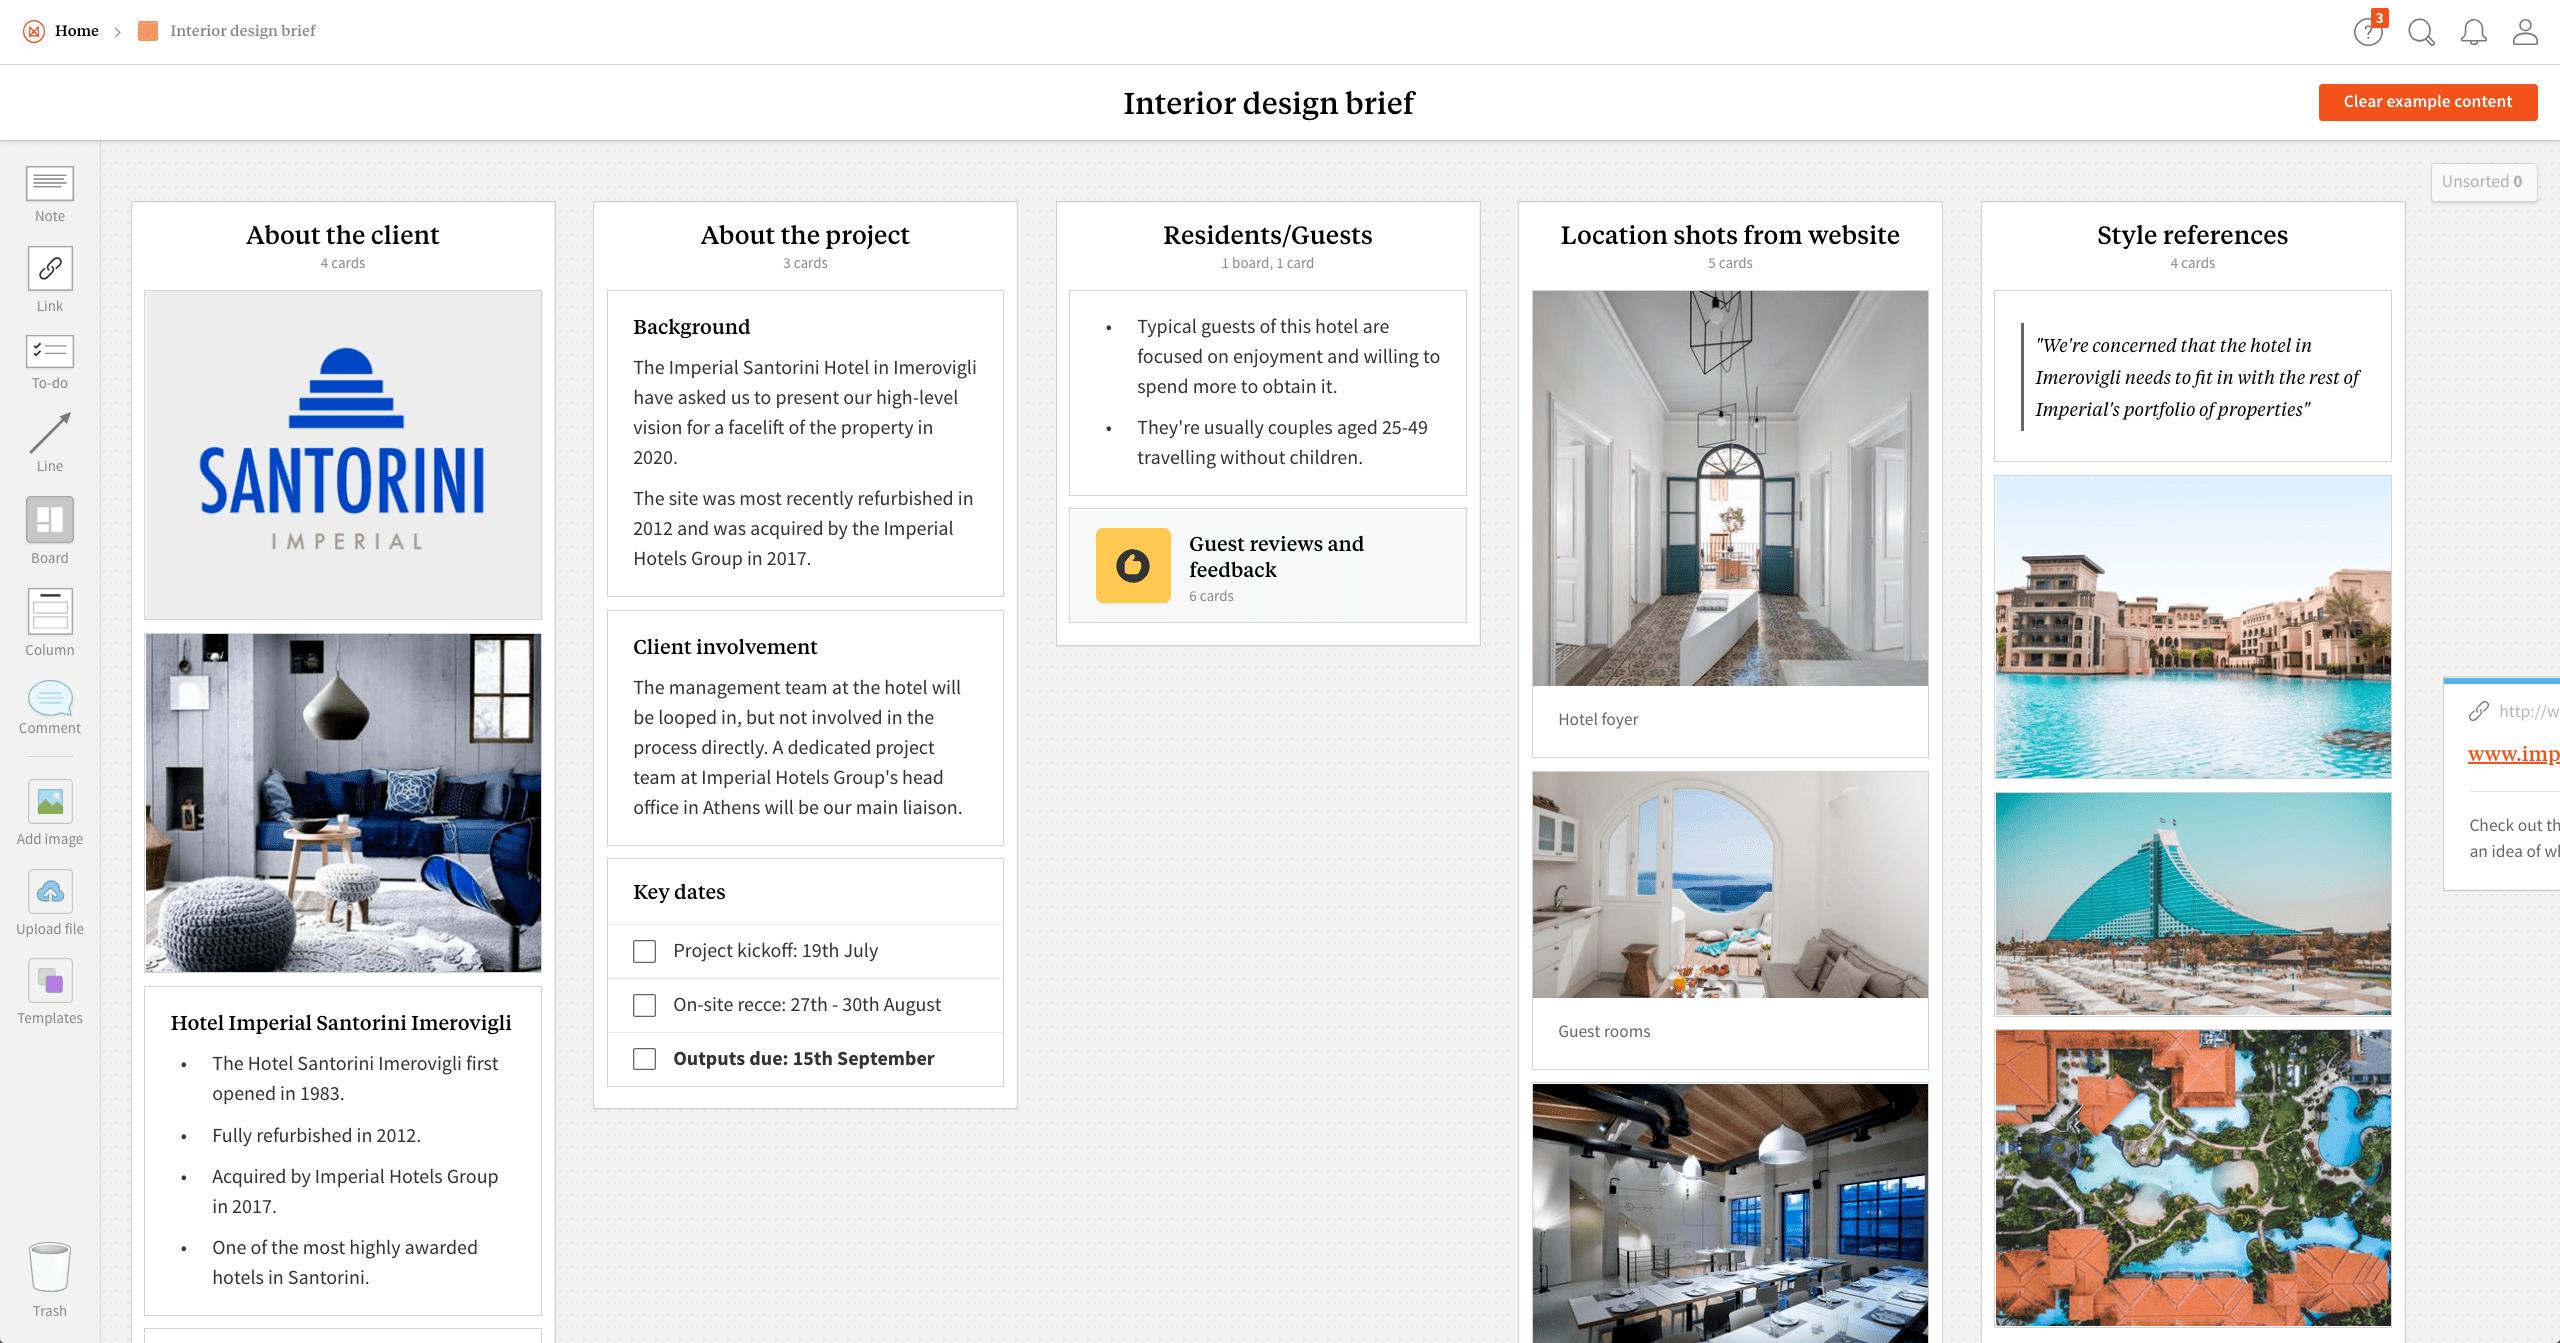 Completed Interior Design Brief Template In Milanote App